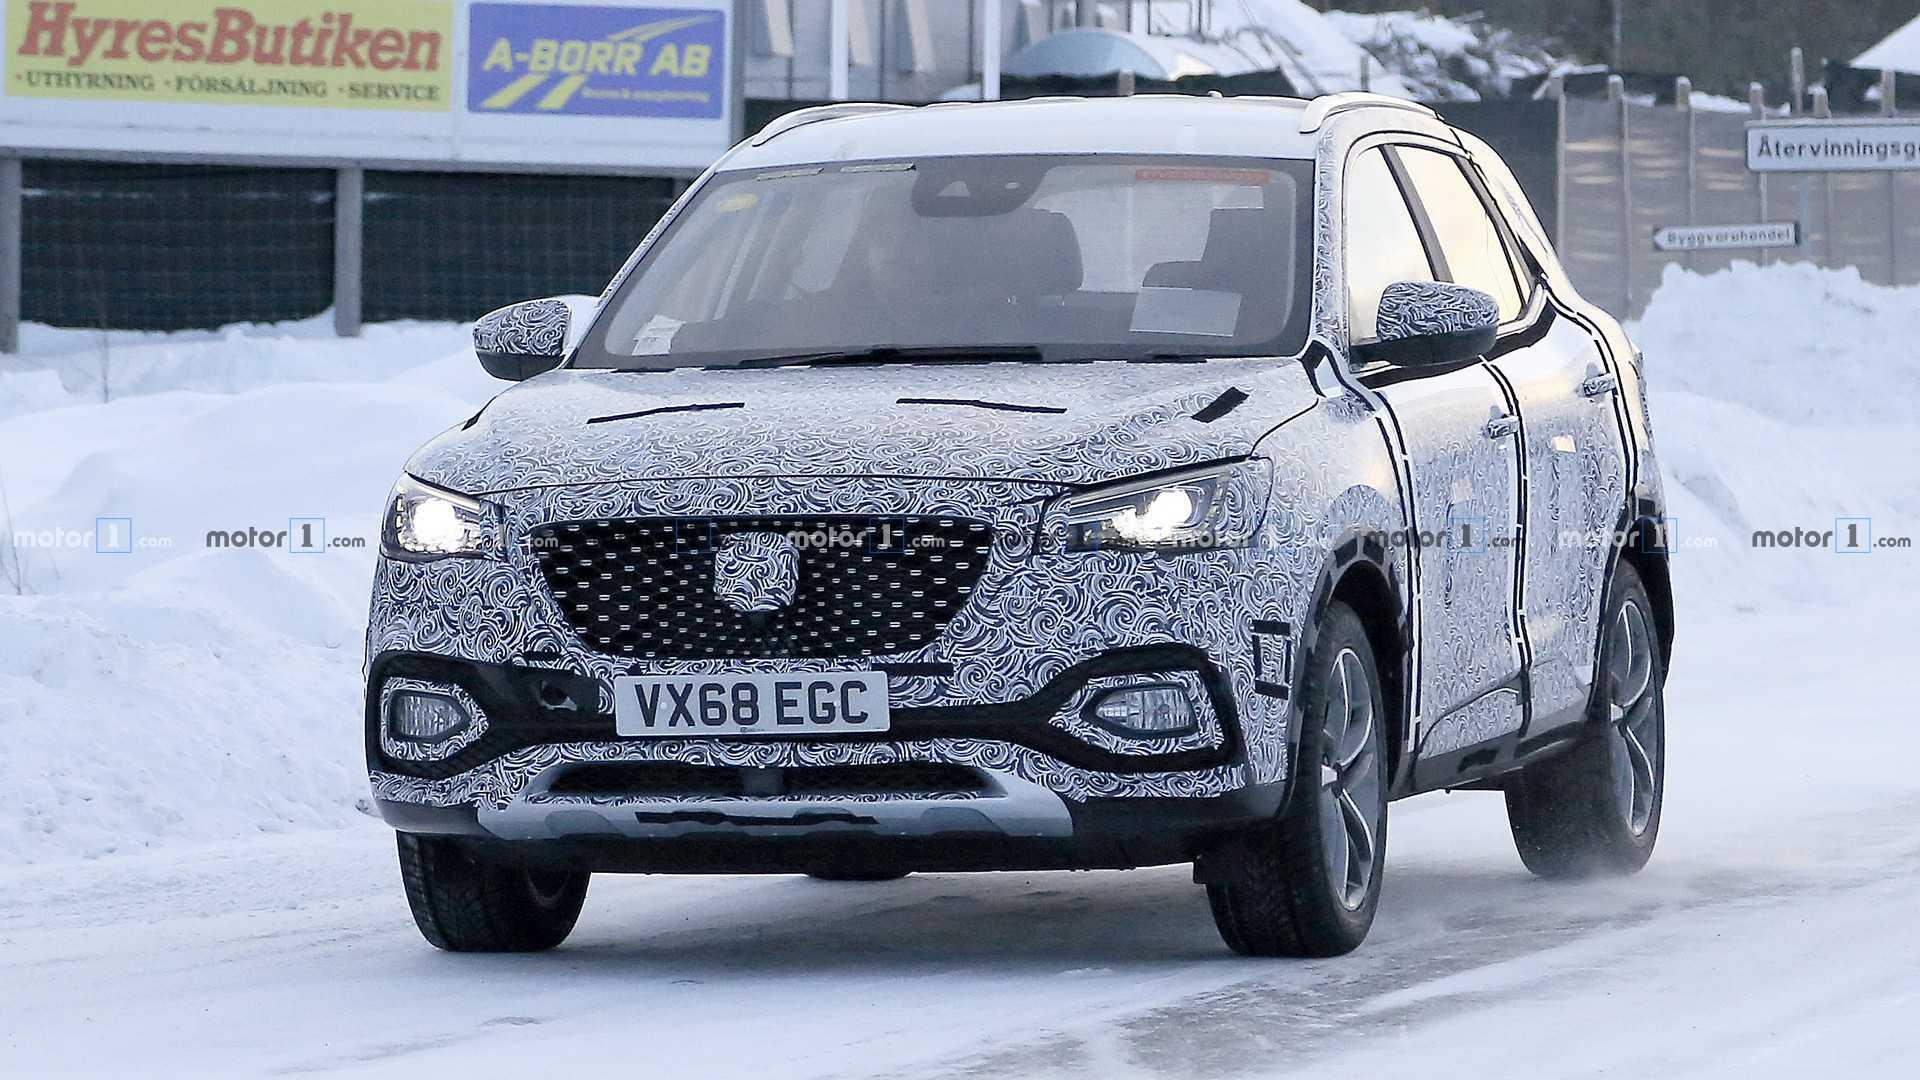 MG X-Motion量产版北欧试车谍照曝光 年底上市